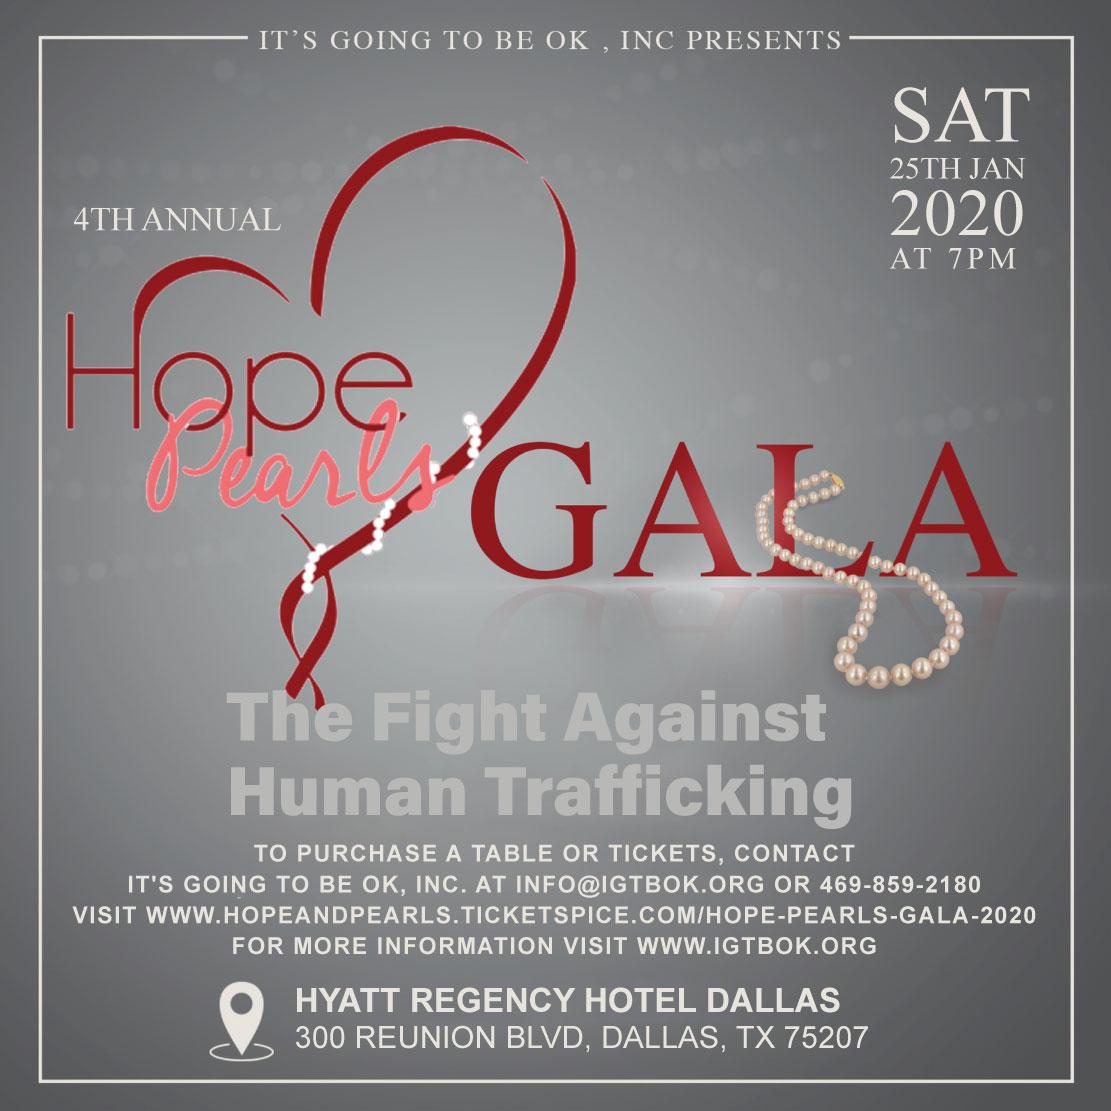 Hope & Pearls Gala 2018